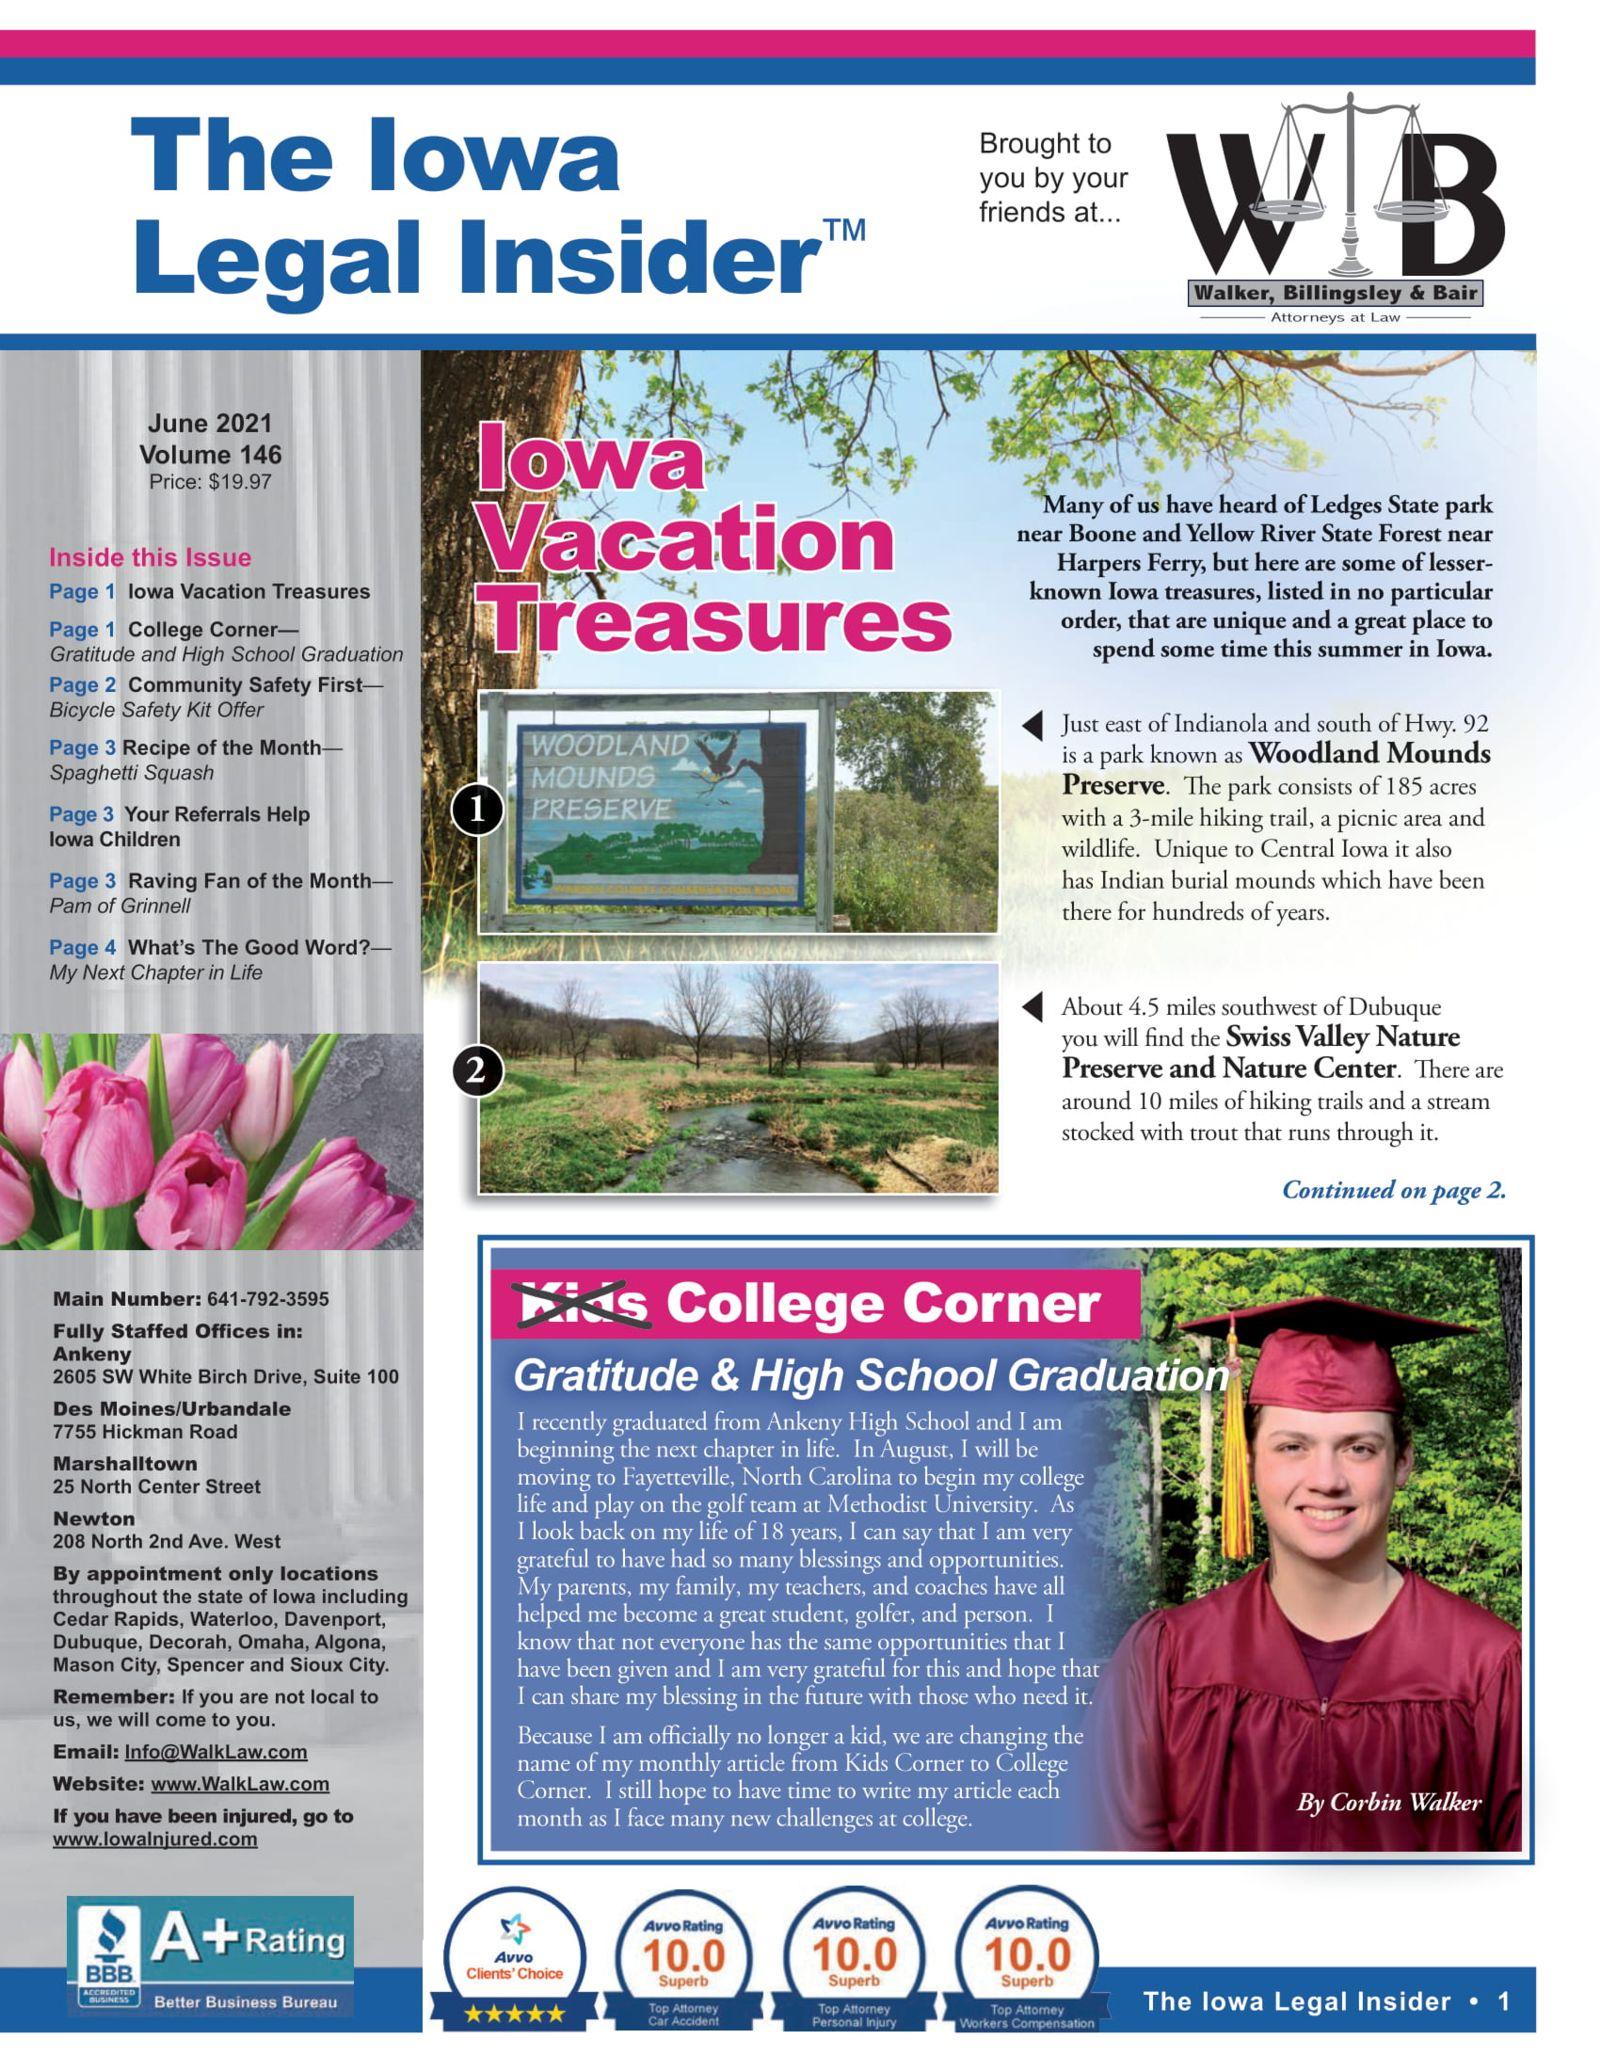 iowa legal insider Iowa Vacation Treasures